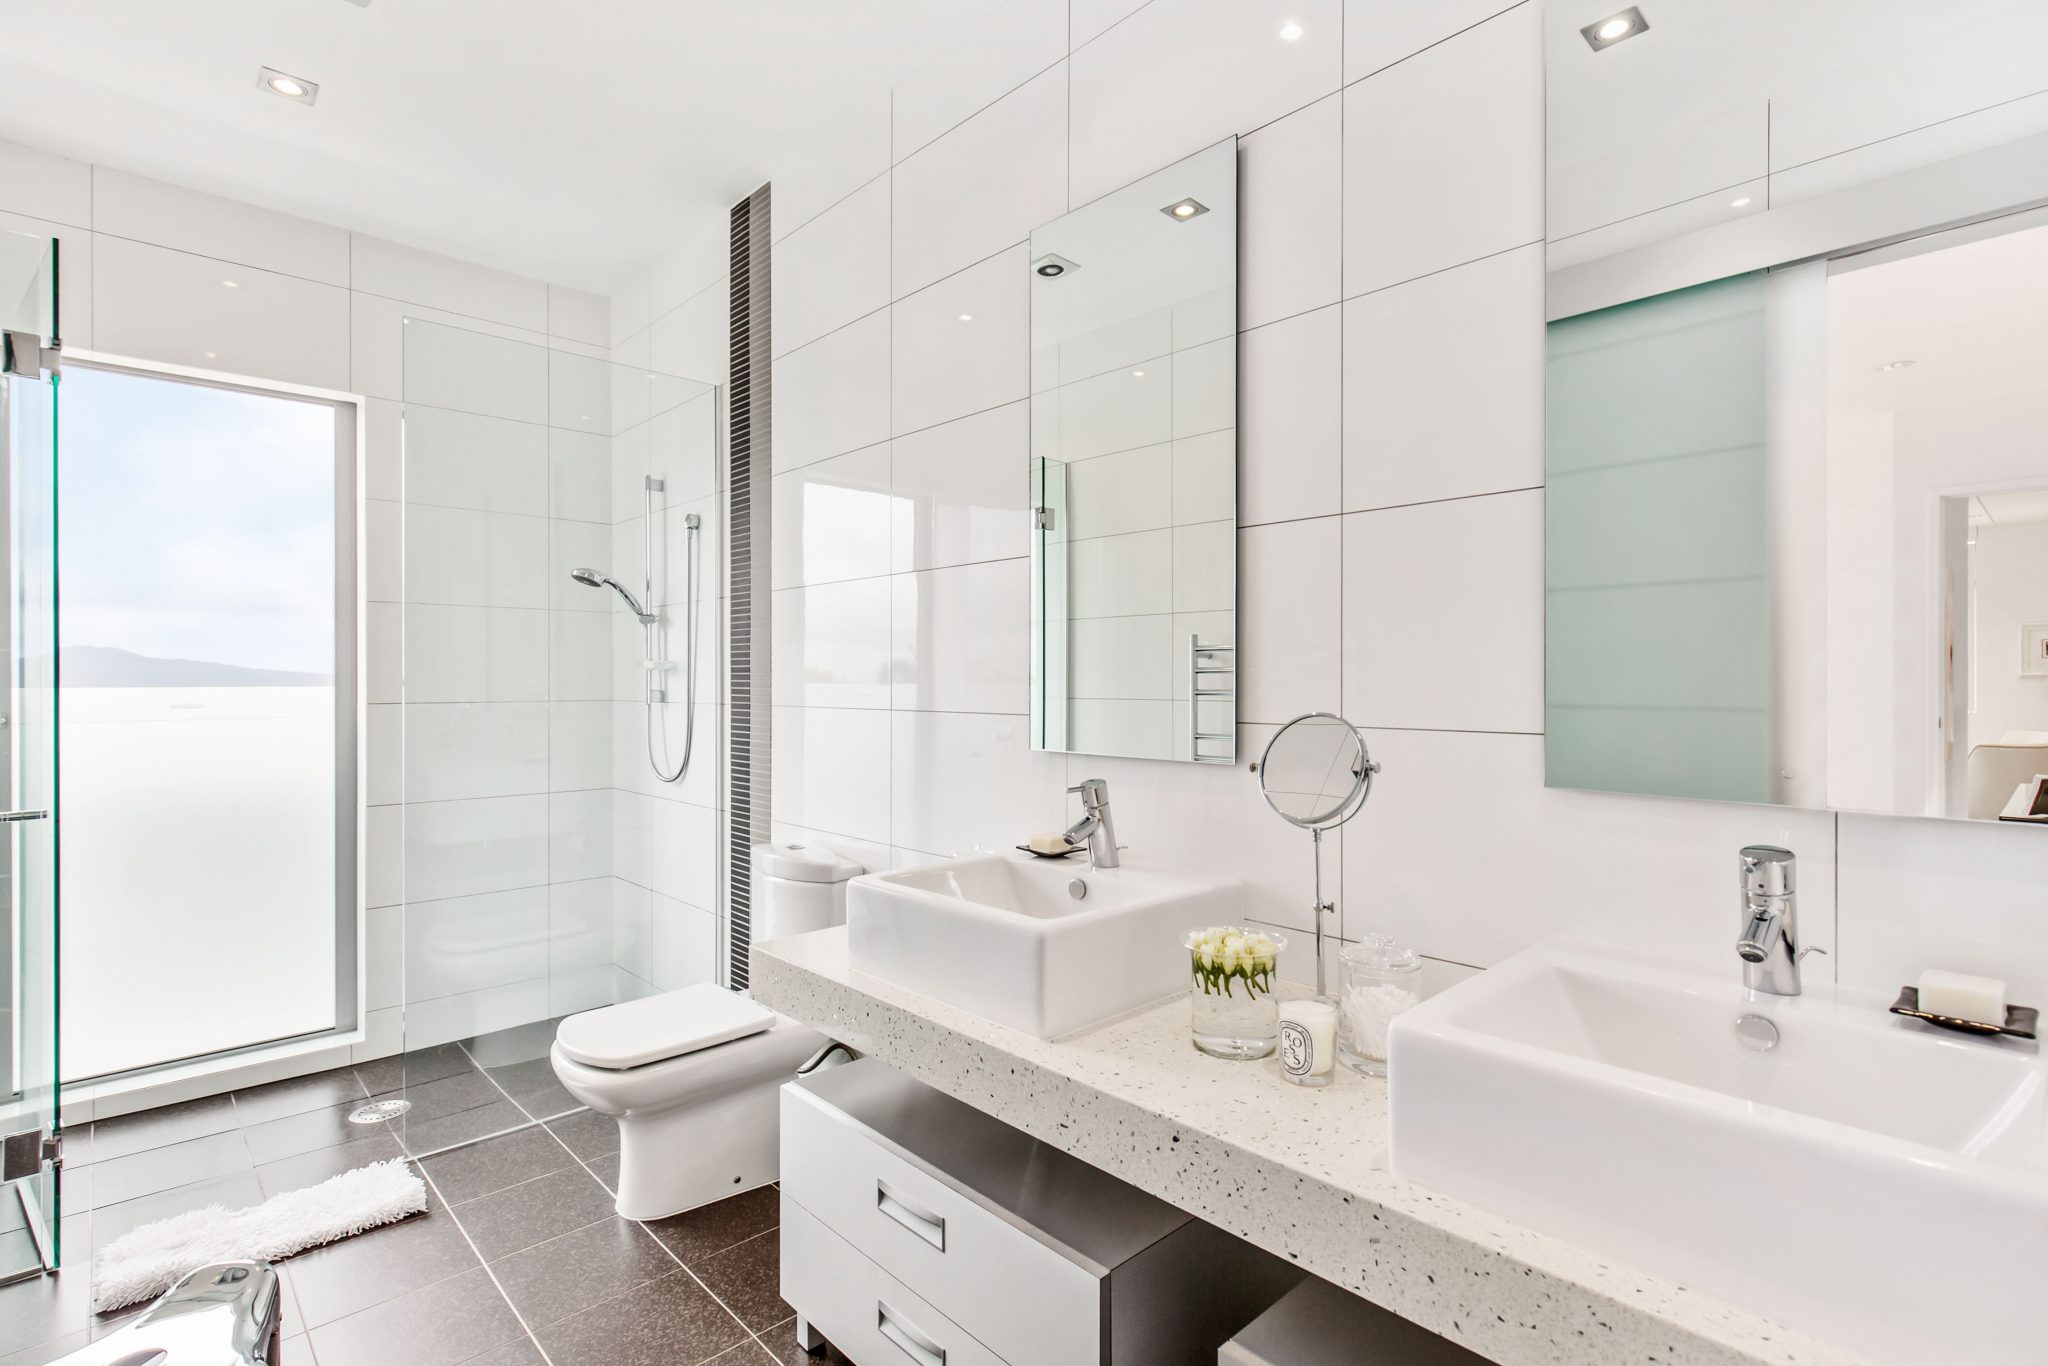 Sydney based interior designers